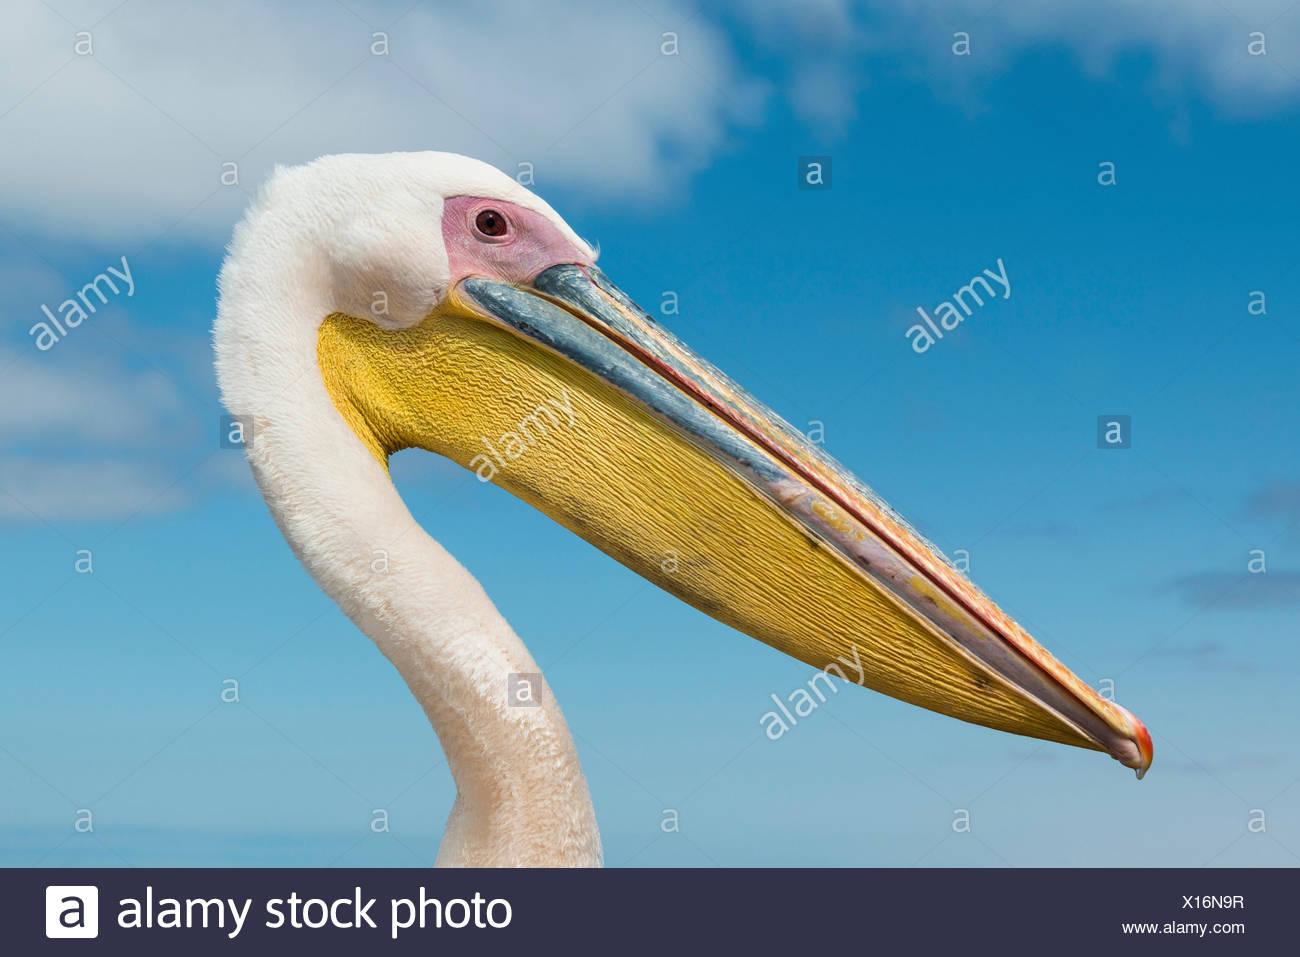 Great White Pelican (Pelecanus onocrotalus), portrait, Walvis Bay, Namibia - Stock Image